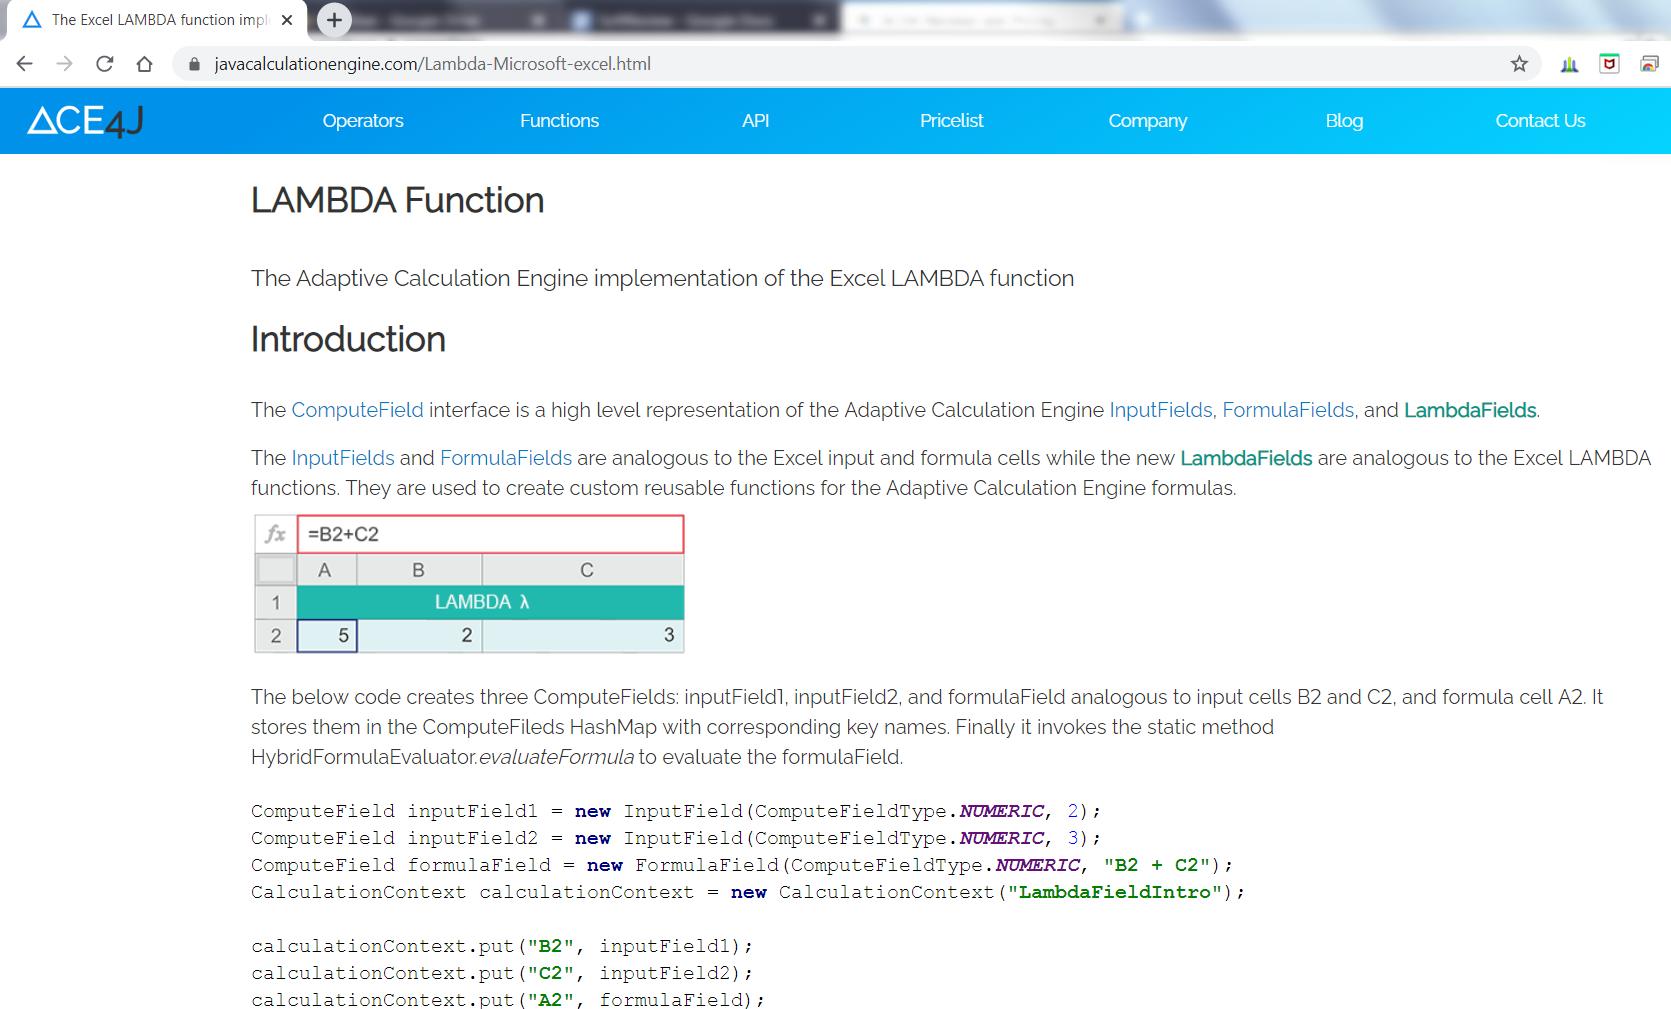 The ACE4J Lambda Function